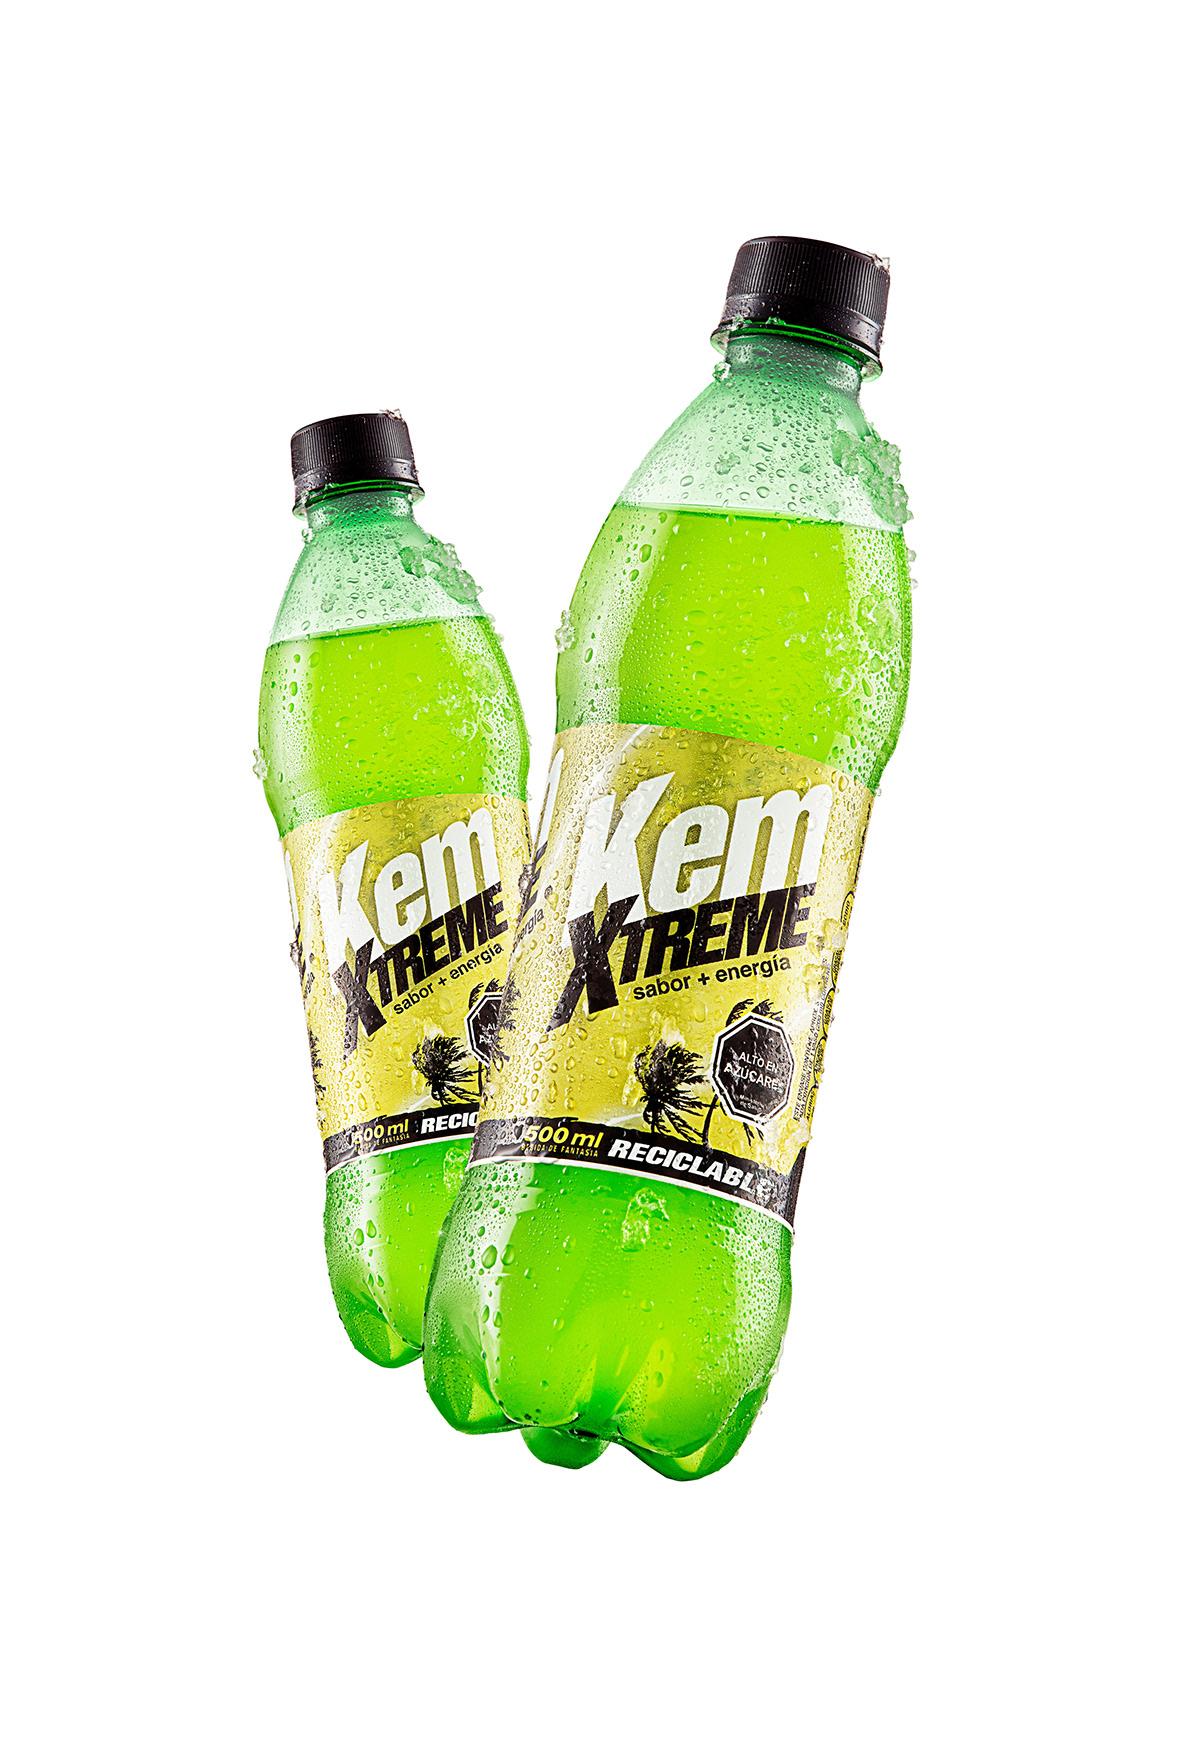 Advertising  chile energetic extreme kem power retouch soda